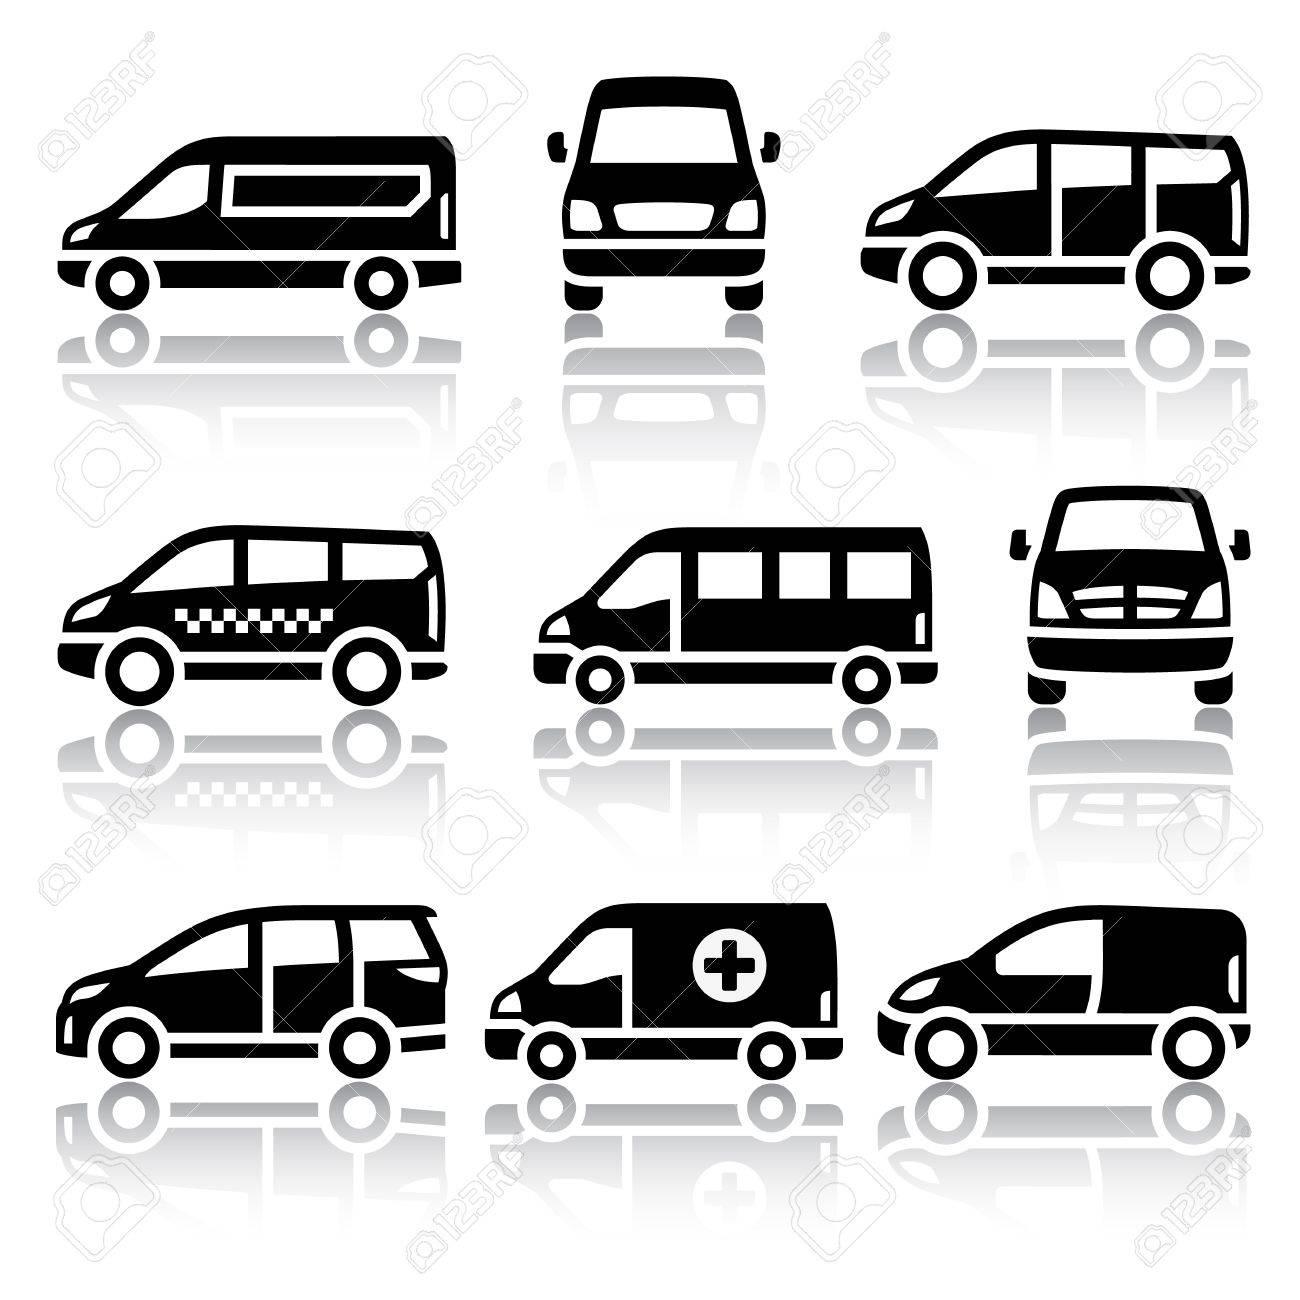 Set of transport icons - Van Stock Vector - 19490716